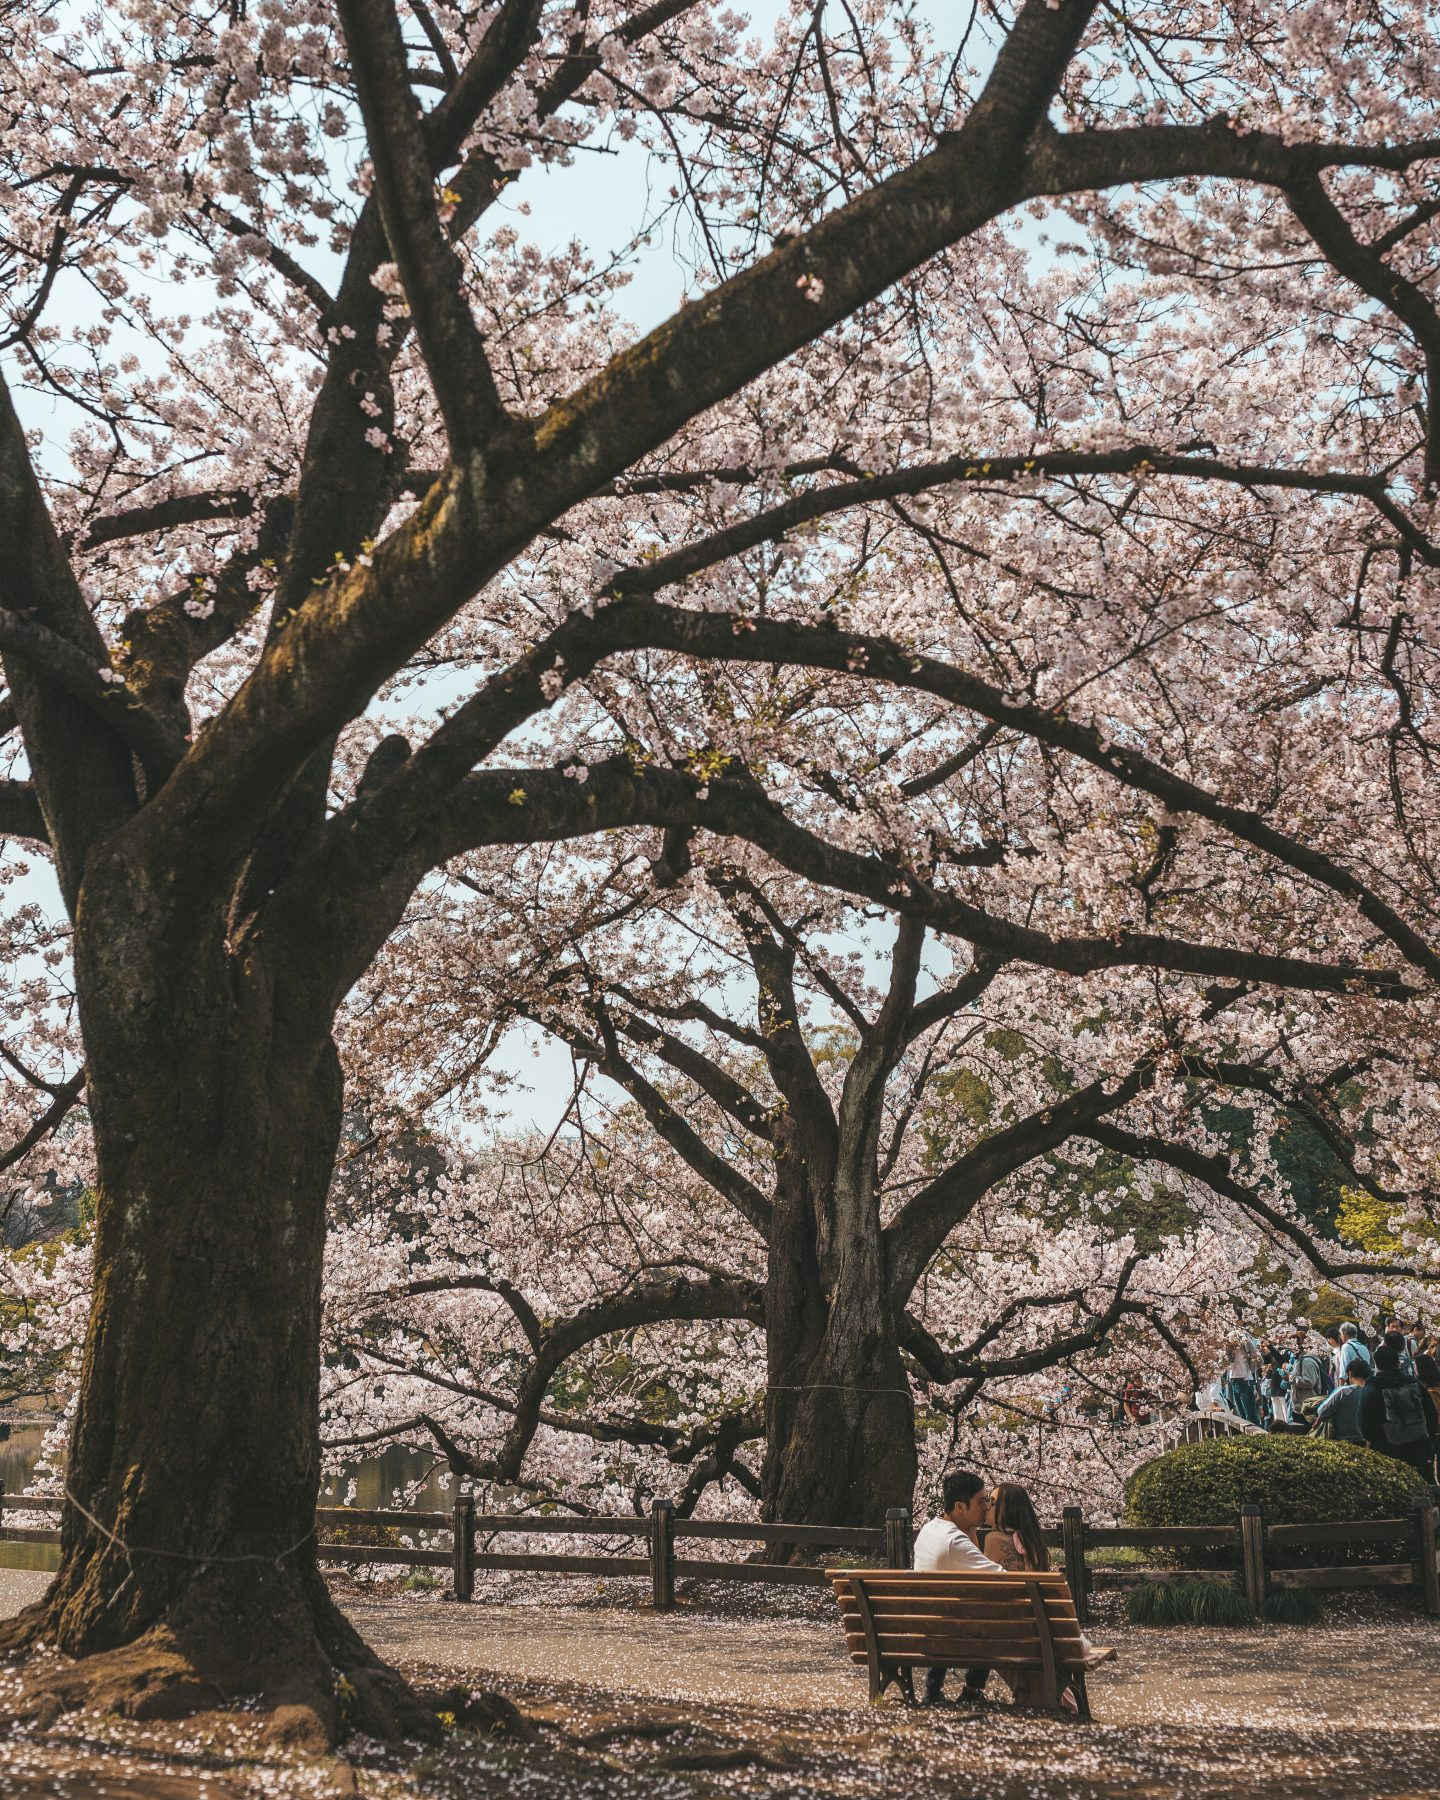 shinjuku gyoen garden couple kissing